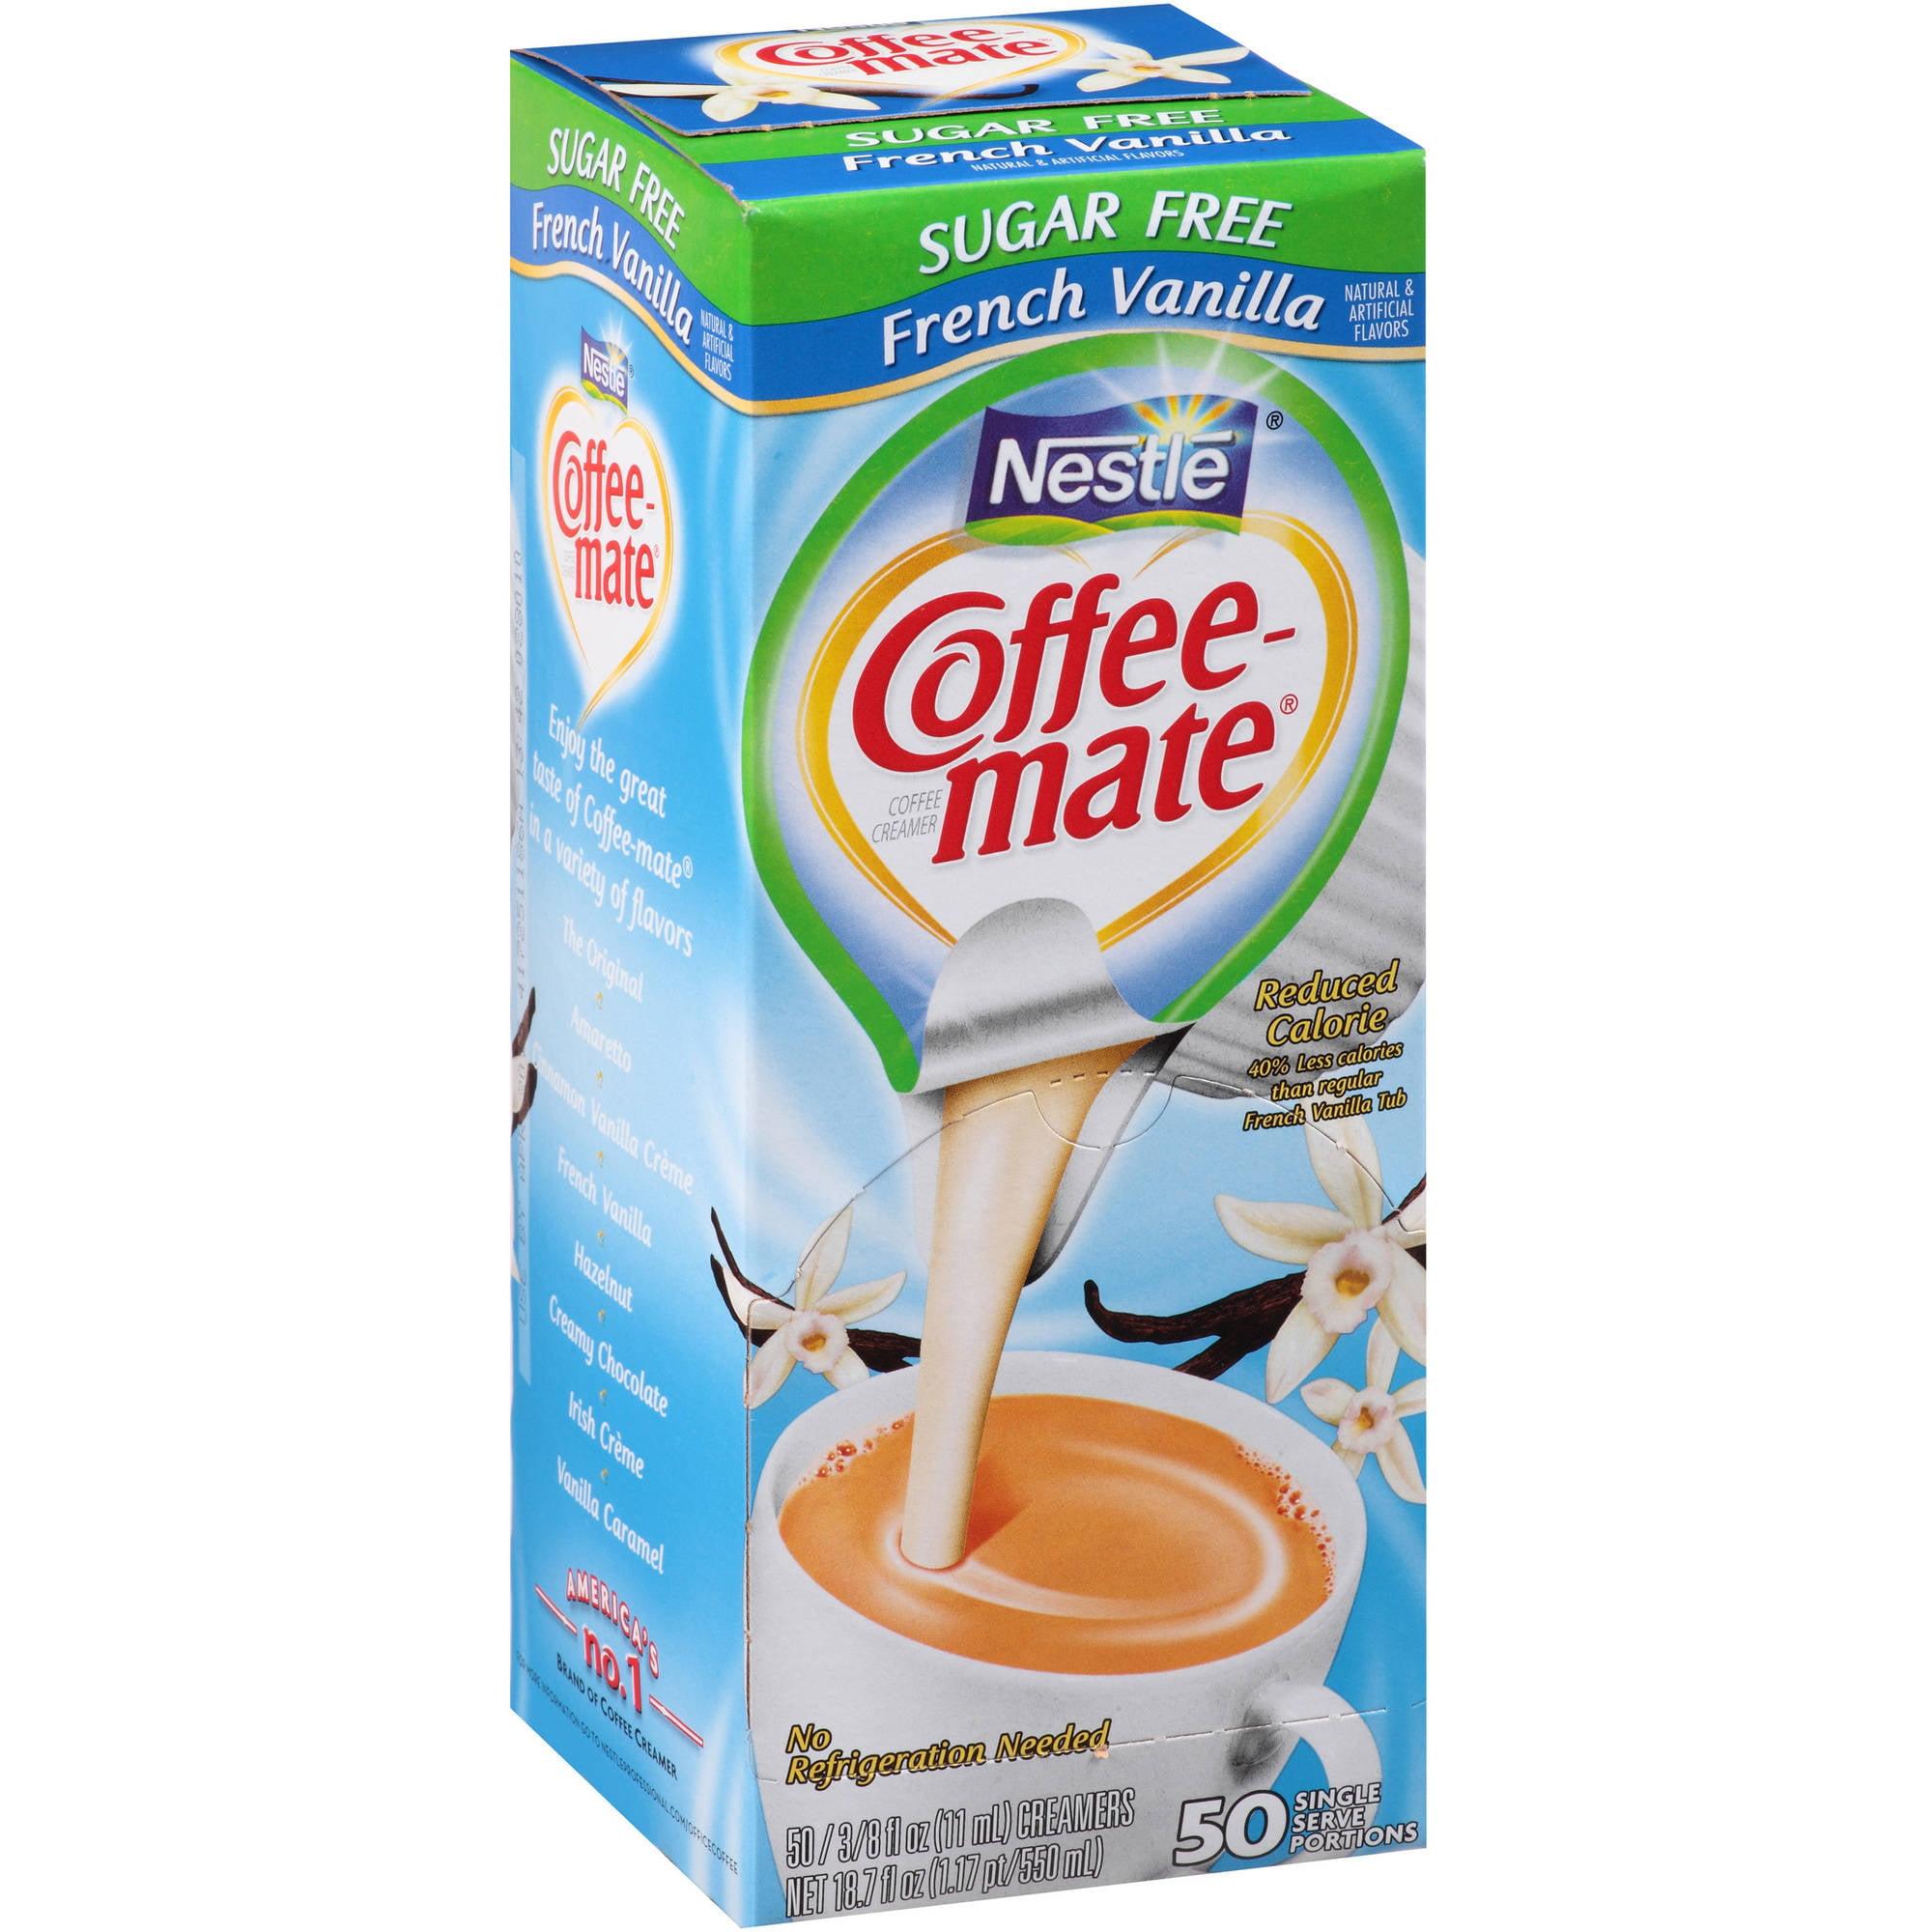 Nestlé Coffee-mate Sugar Free French Vanilla Coffee Creamer 50-0.375 fl. oz. Tubs